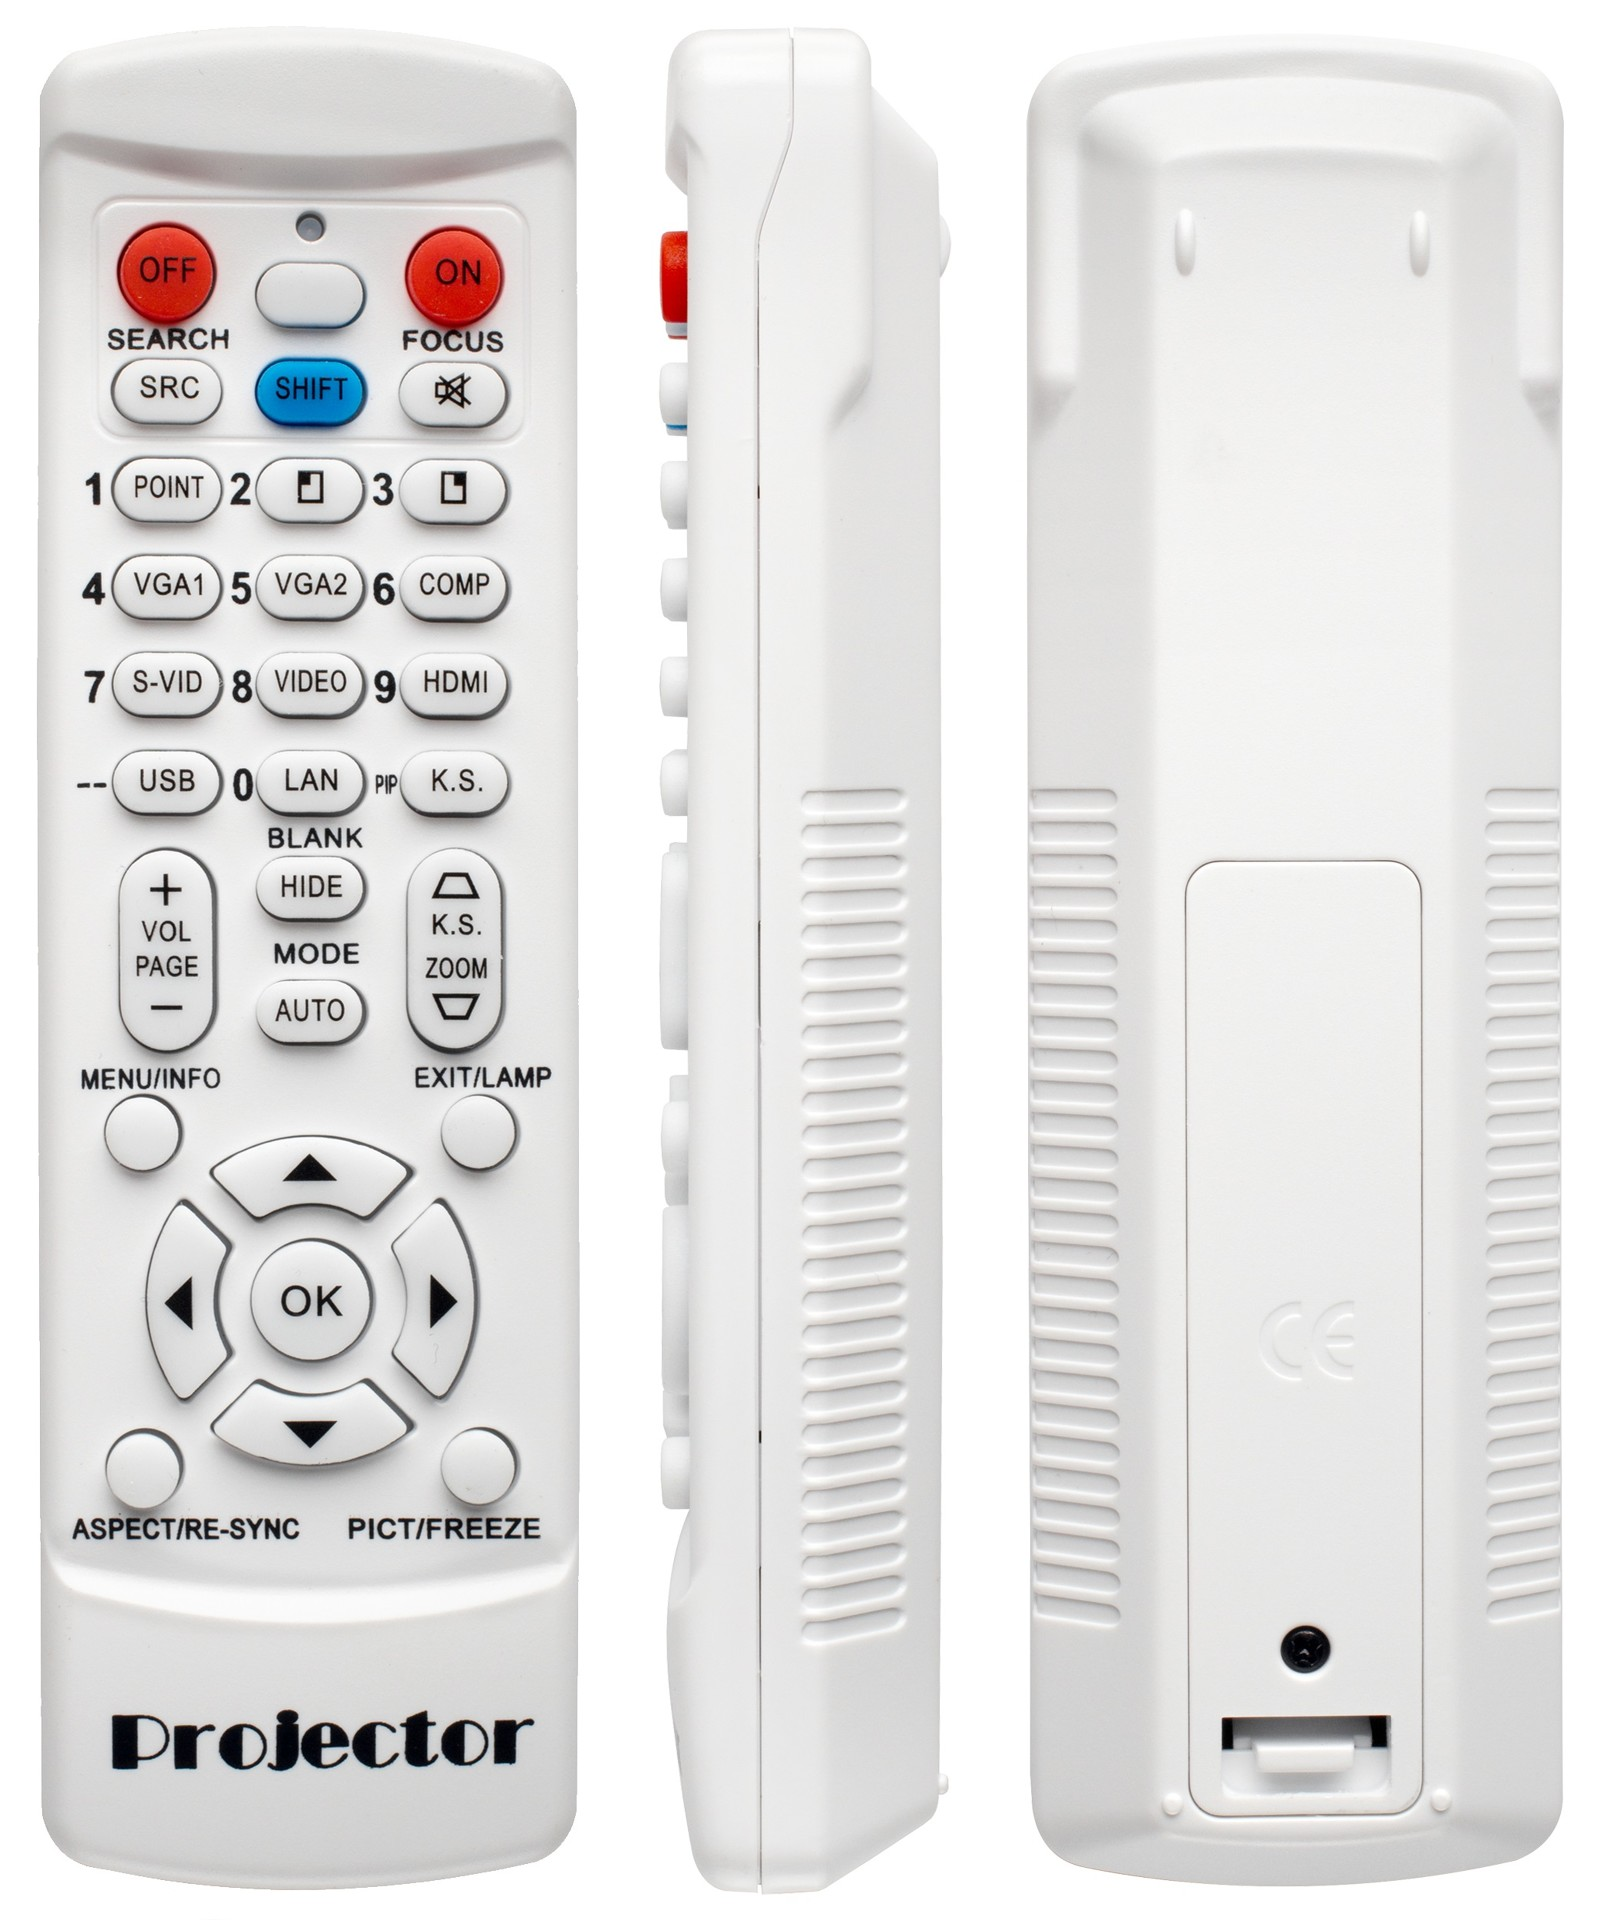 RCCreator - USB Programmable Universal Remote Controls